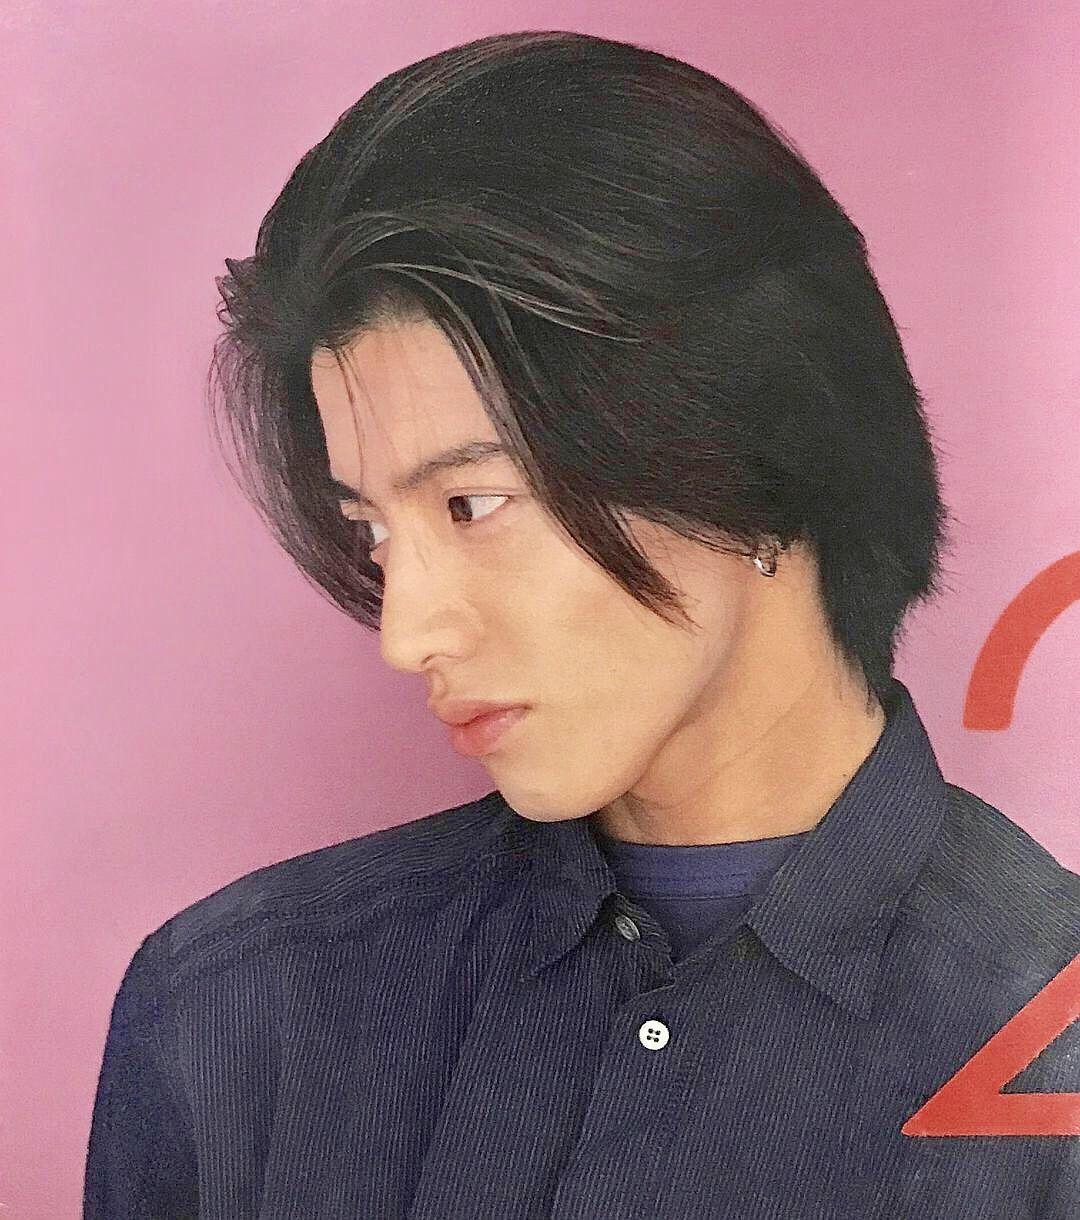 Takuya おしゃれまとめの人気アイデア Pinterest Hamish 長髪 イケメン 80年代ファッション 有名人